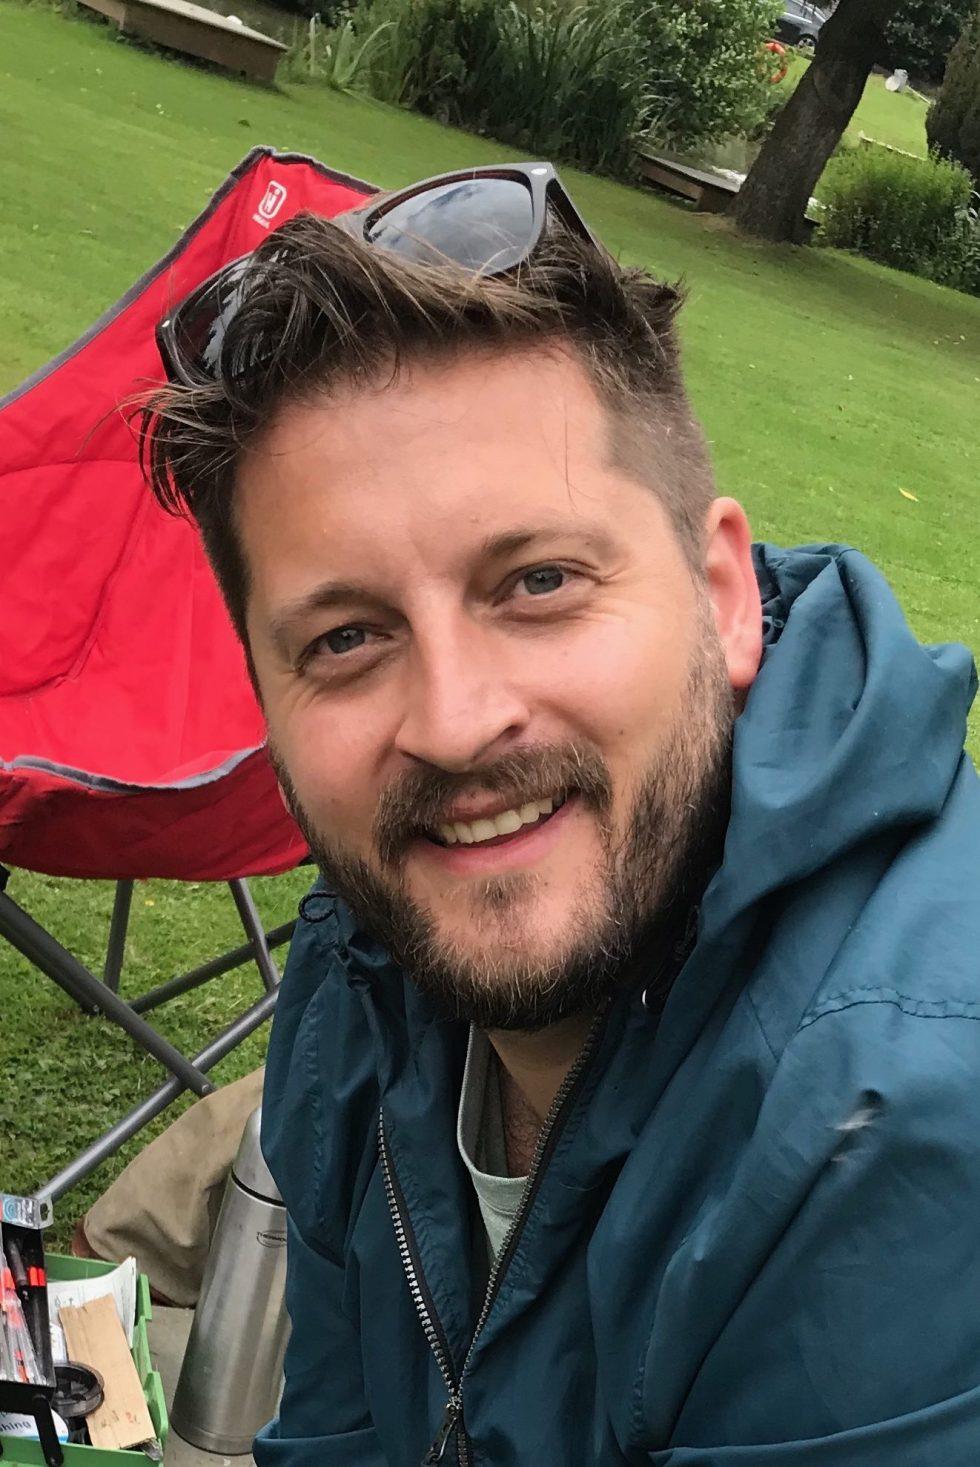 Dan McPherson - Head of R&D and Design